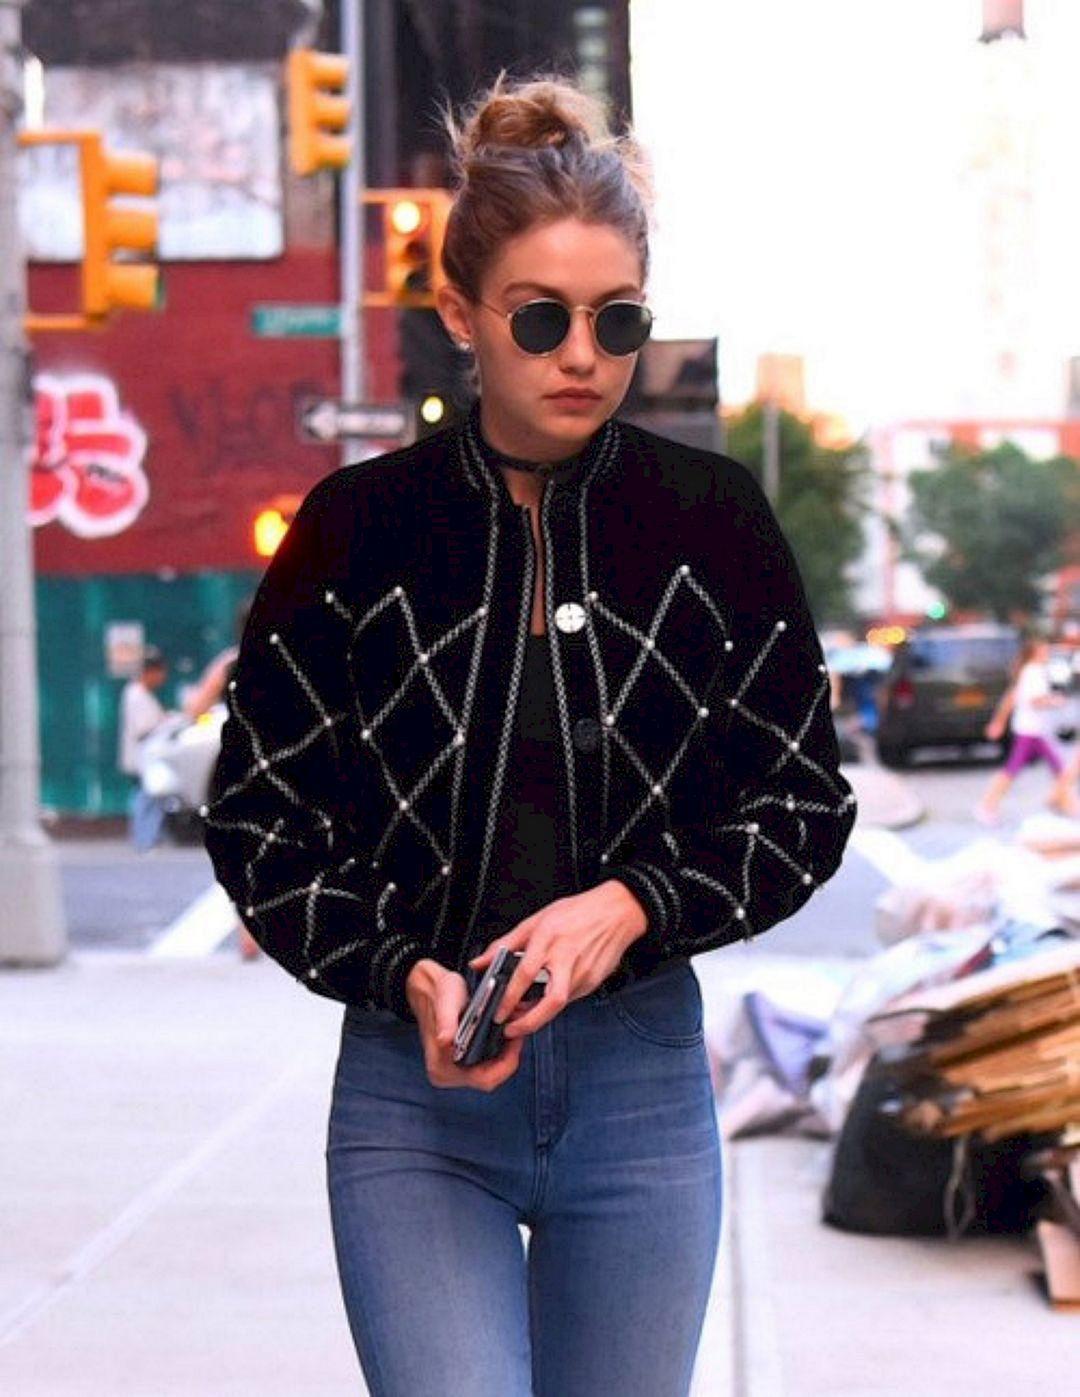 25 Best Gigi Hadid Street Style Moment 2018 #gigihadid